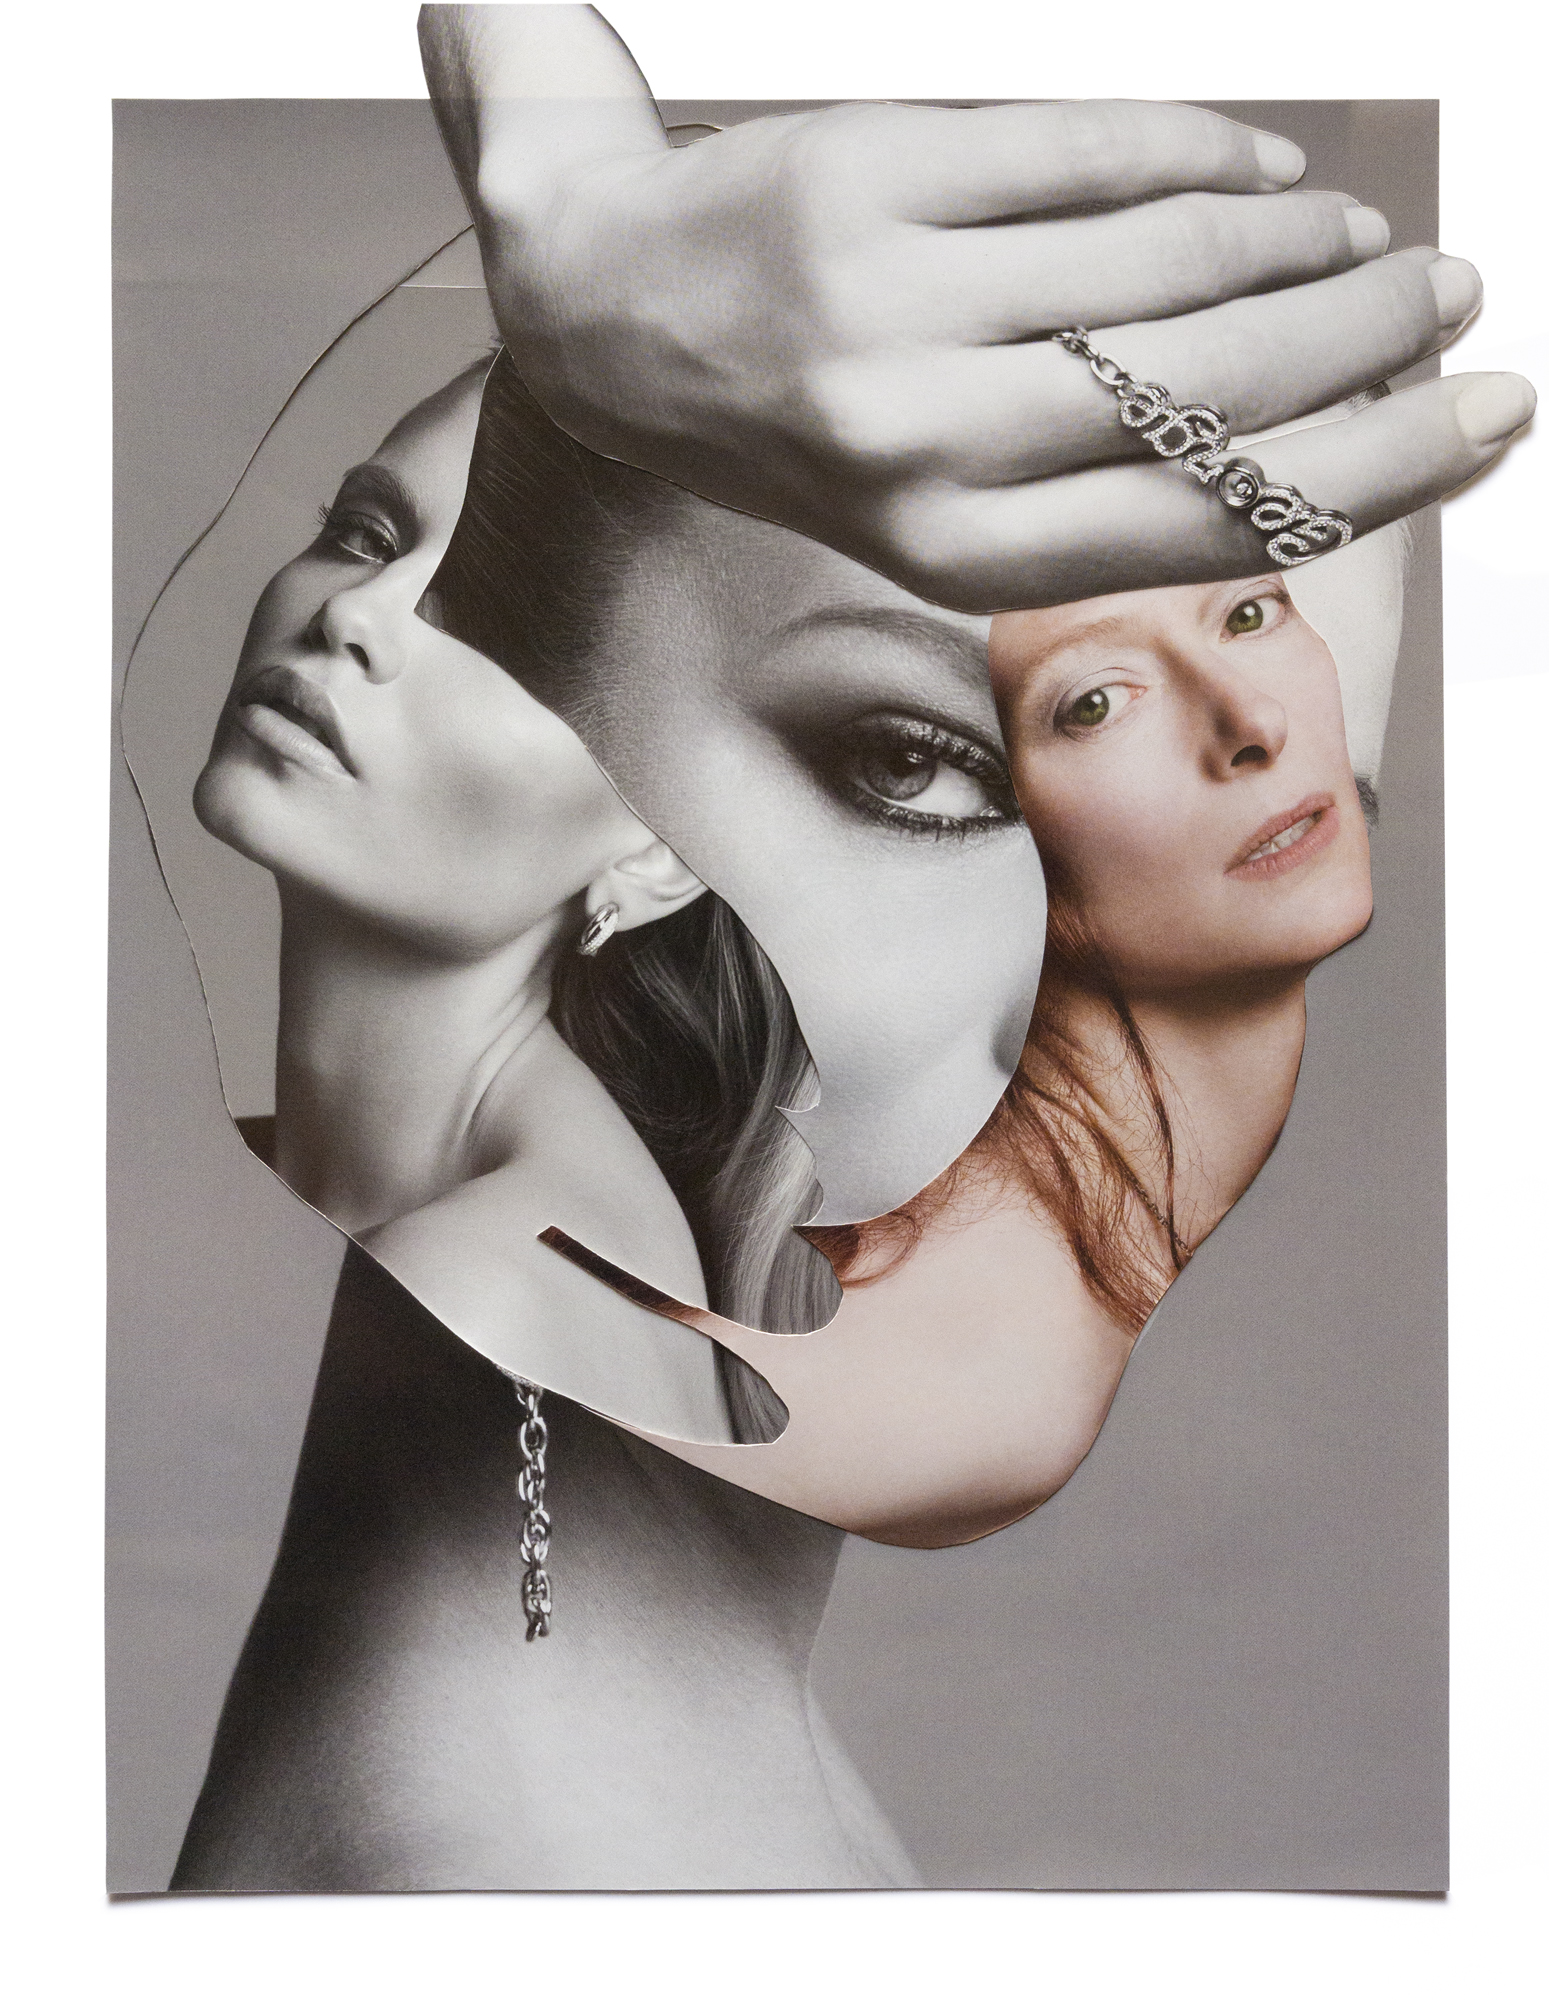 Eva&Tilda&Model (untitled #14).jpg